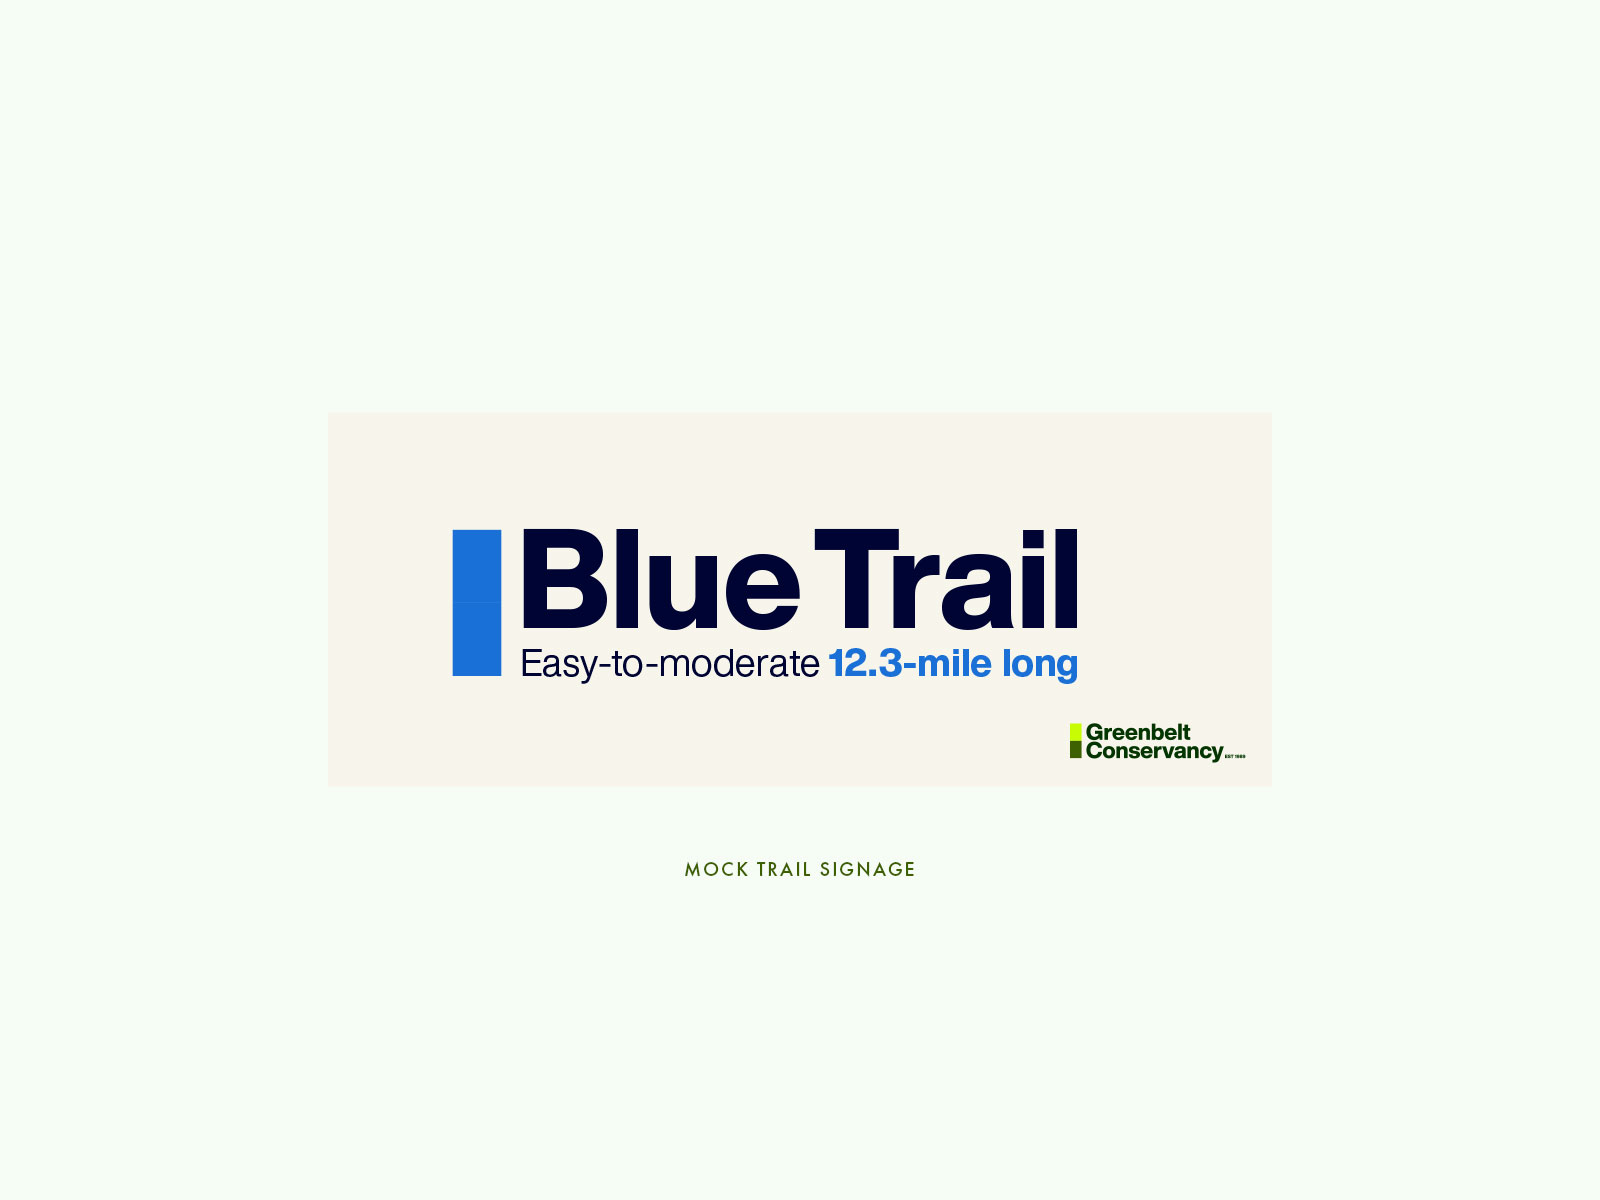 Greenbelt Conservancy rebrand exercise: Signage Mockup